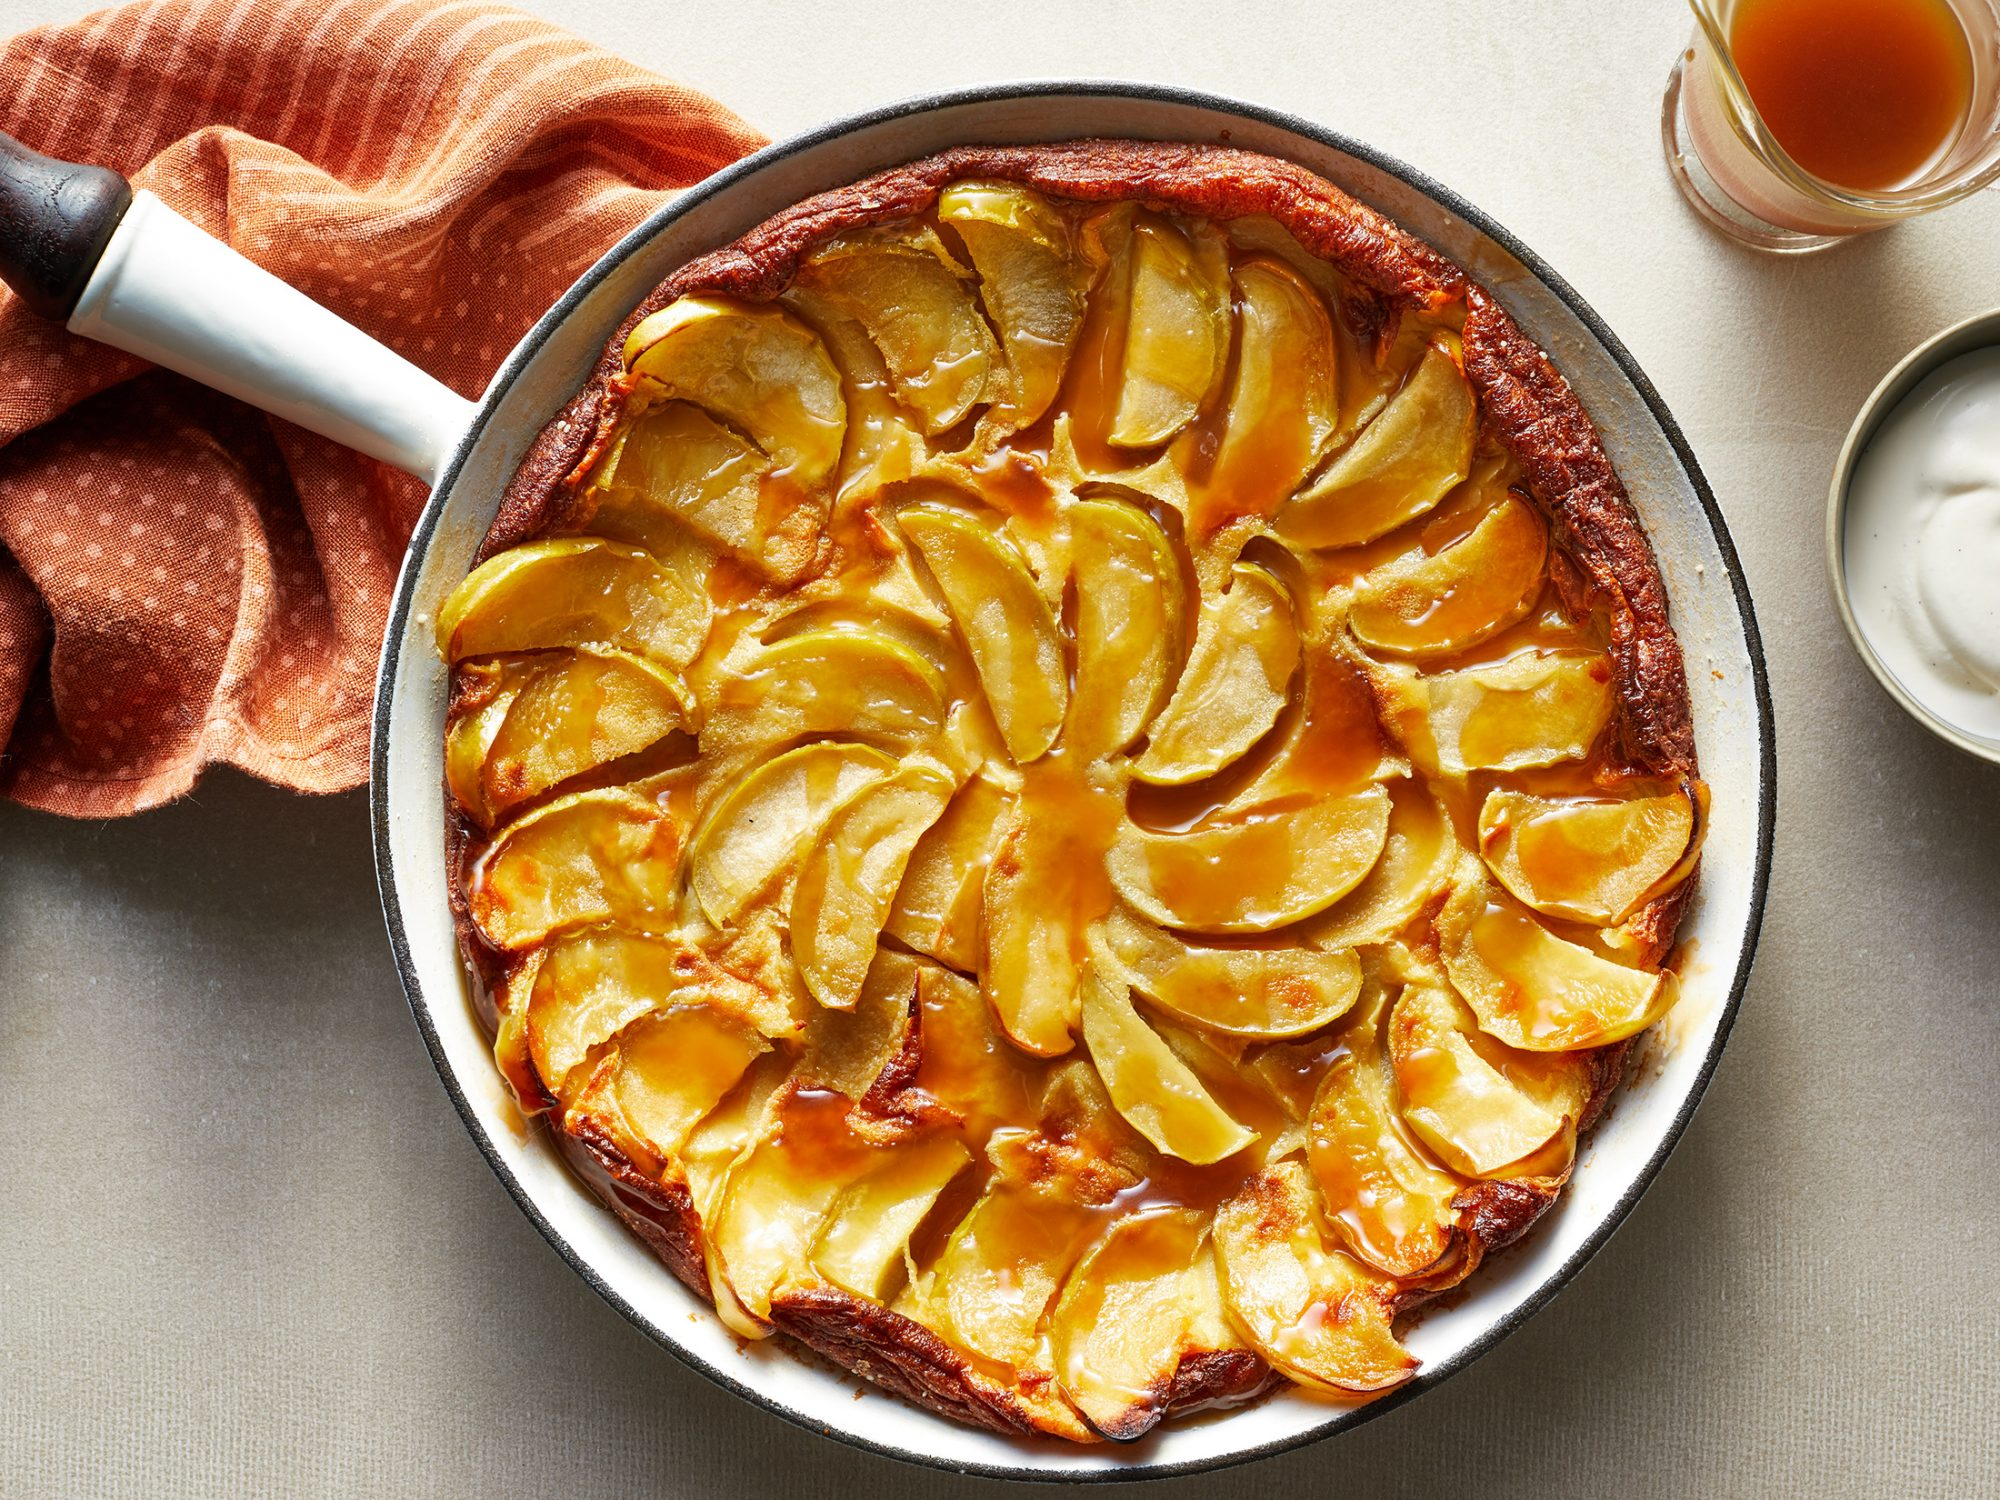 Maple-Caramel Apple Clafoutis image